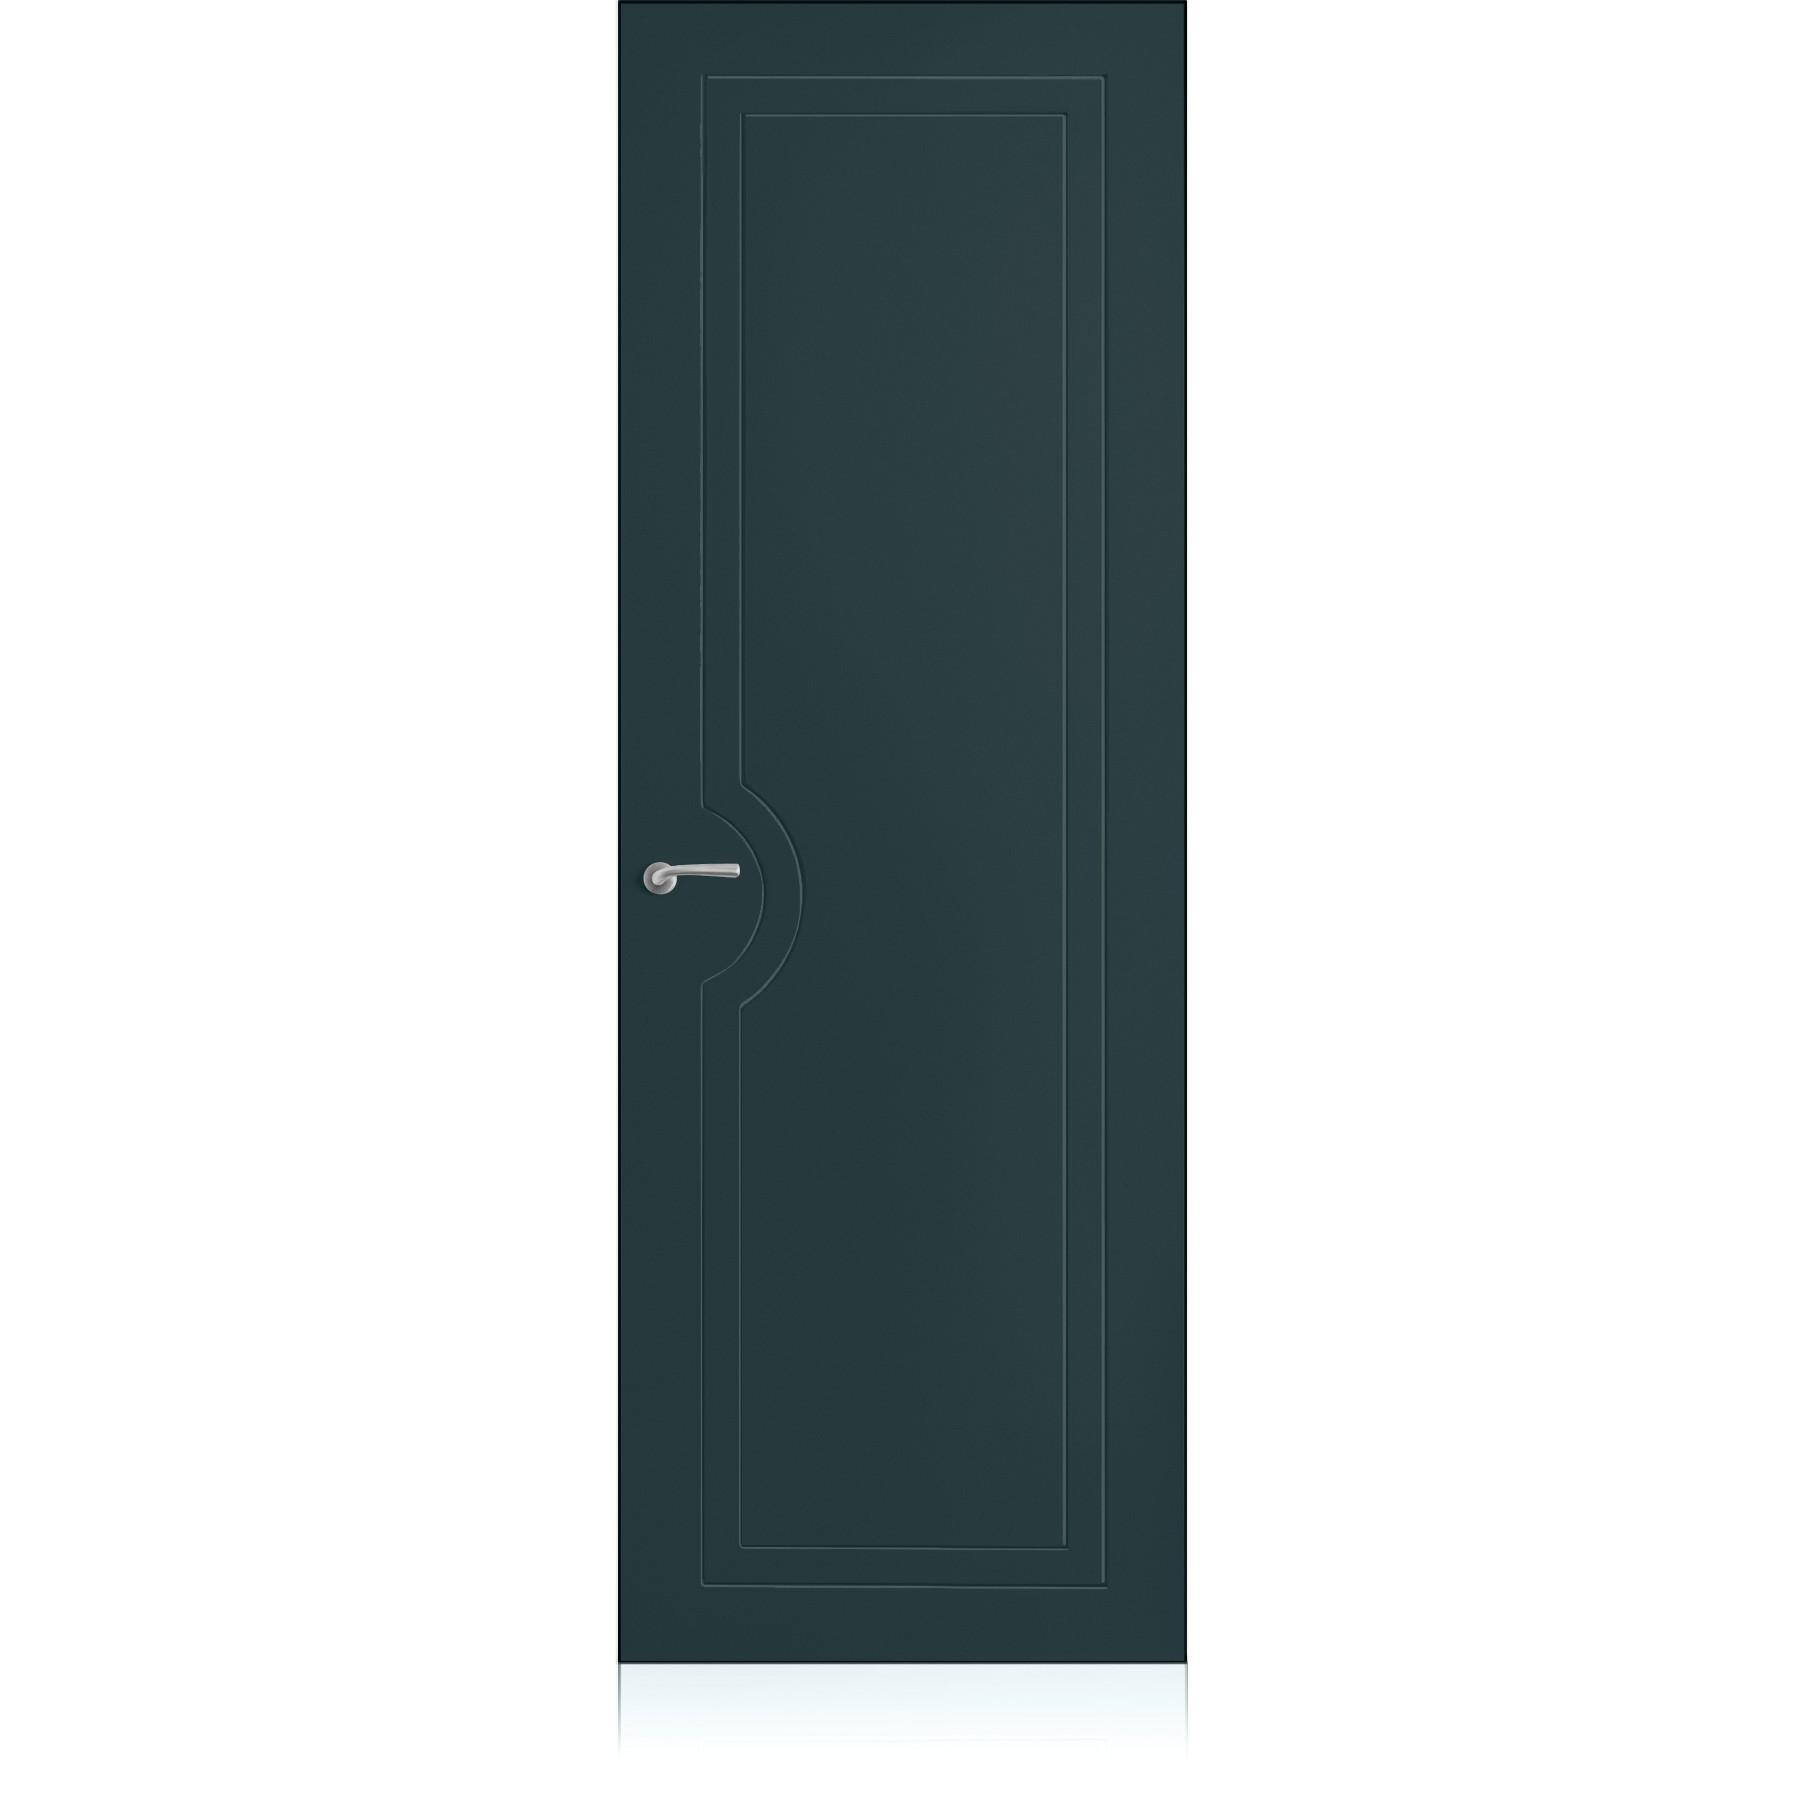 Yncisa/1 Zero Metallo Dark Laccato ULTRAopaco door